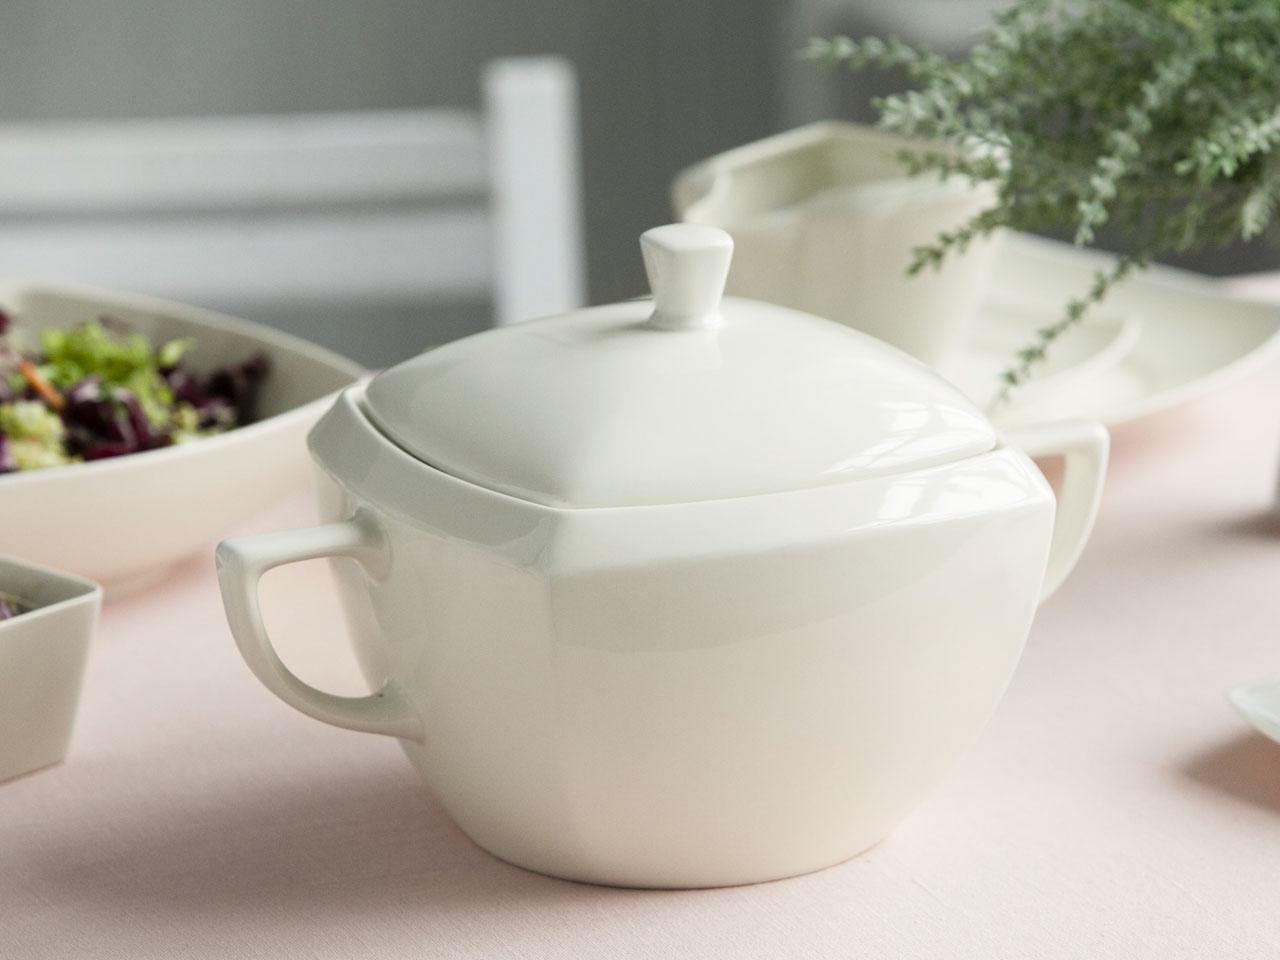 Waza do zupy porcelana Karolina Hiruni 3,5l